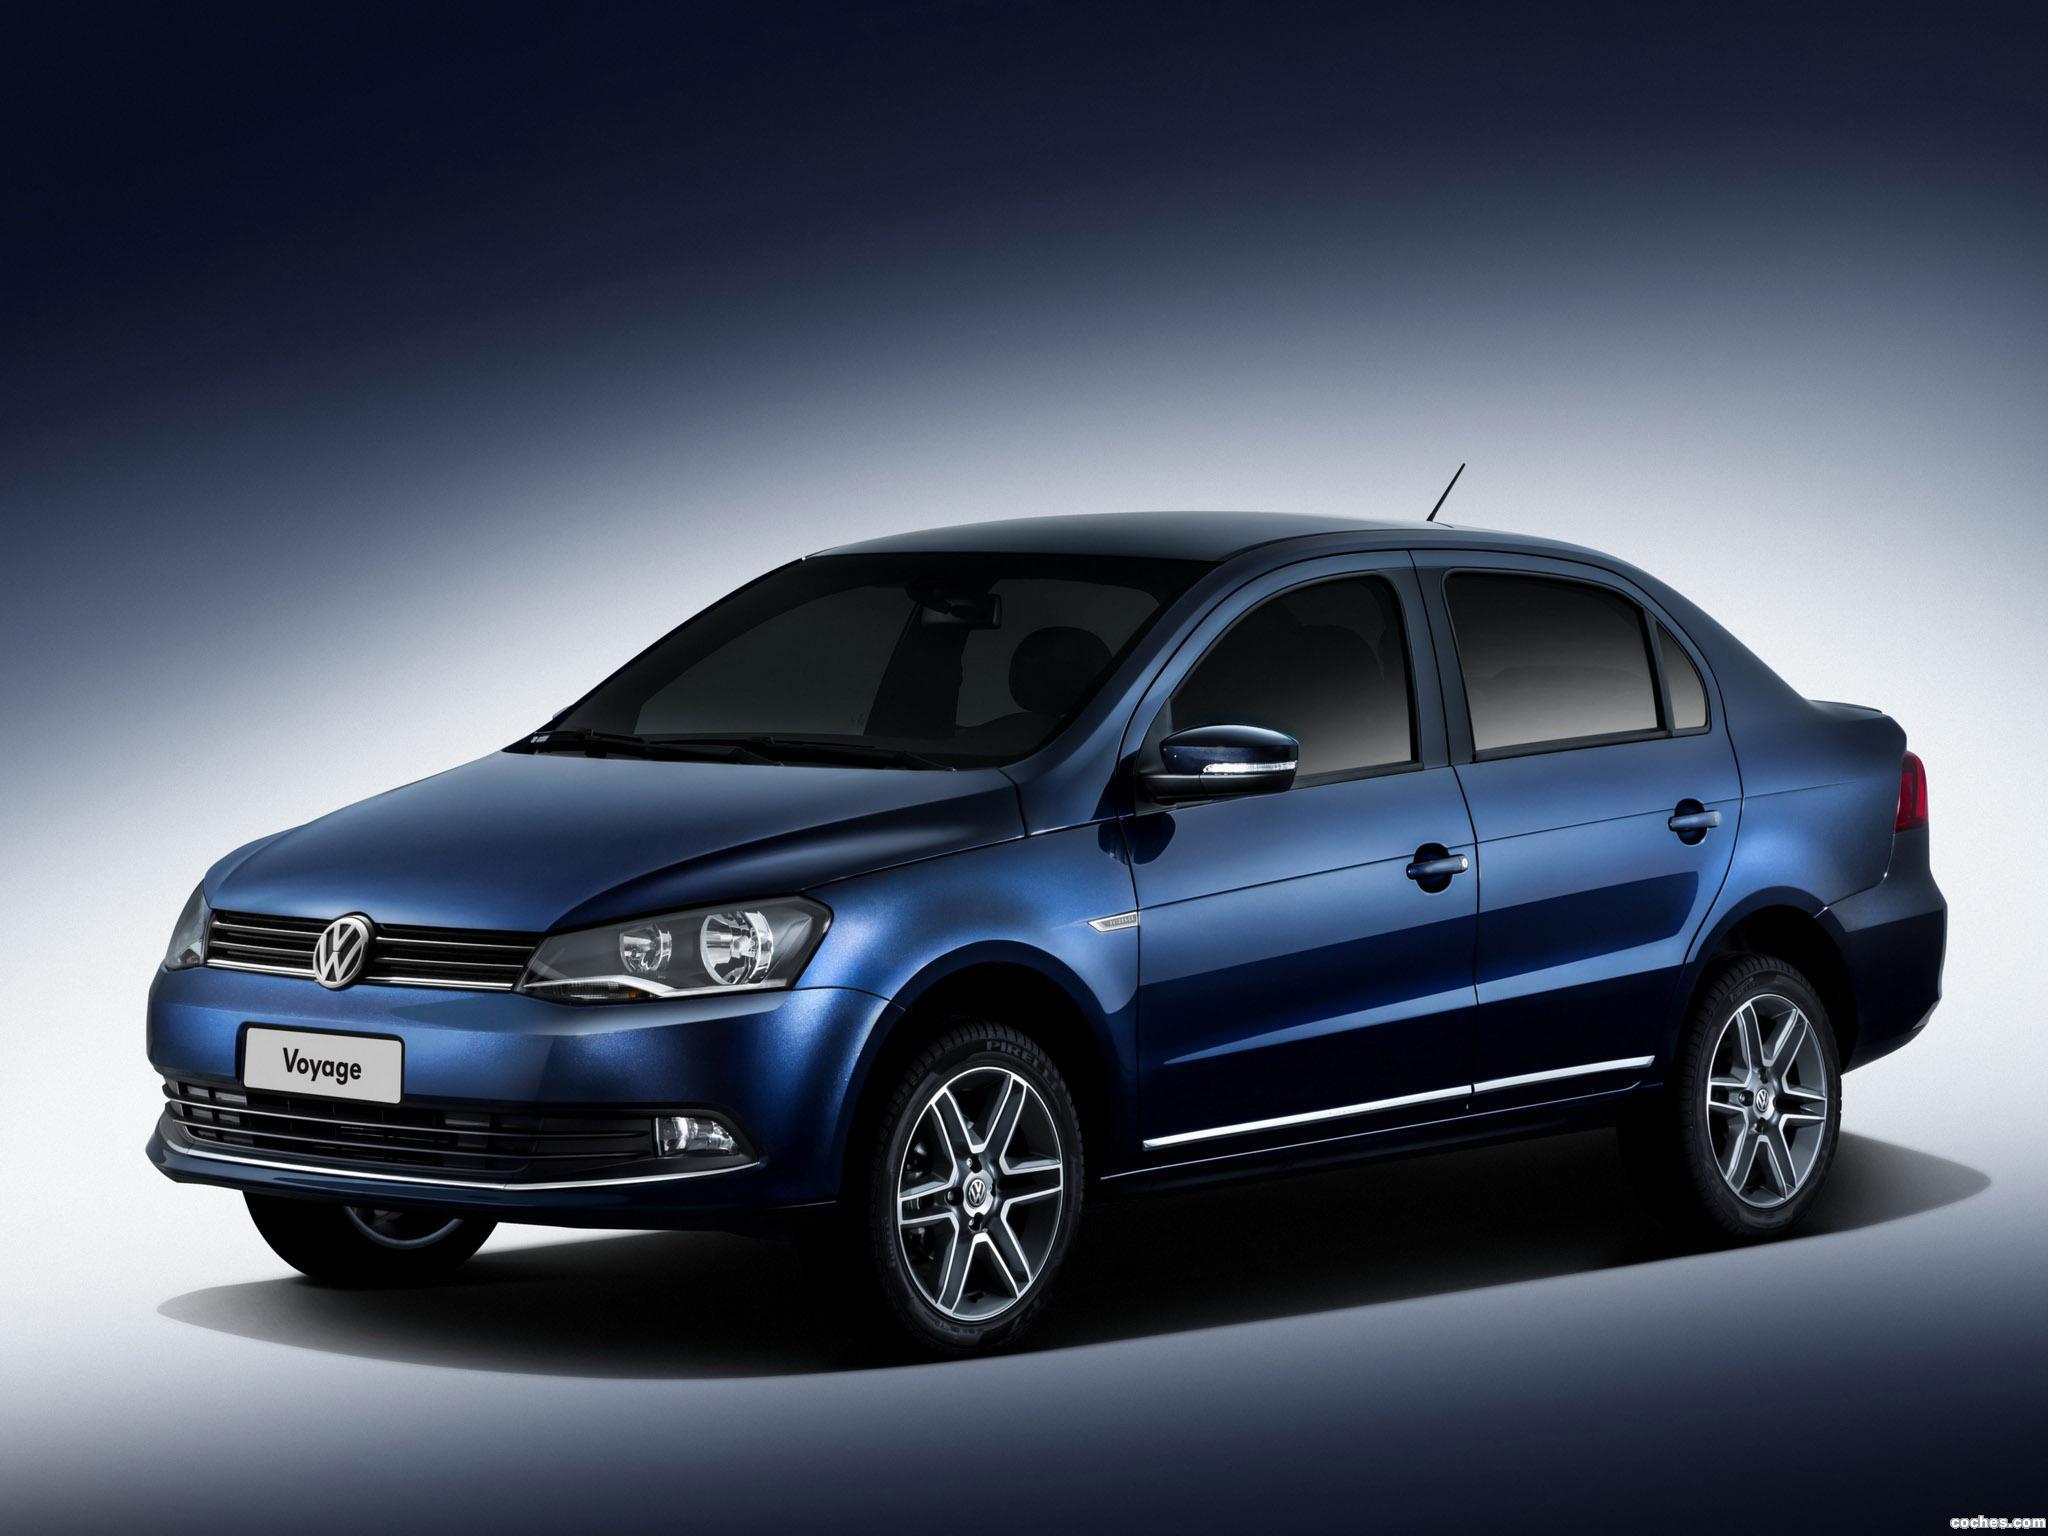 Foto 0 de Volkswagen Voyage Evidence 2014